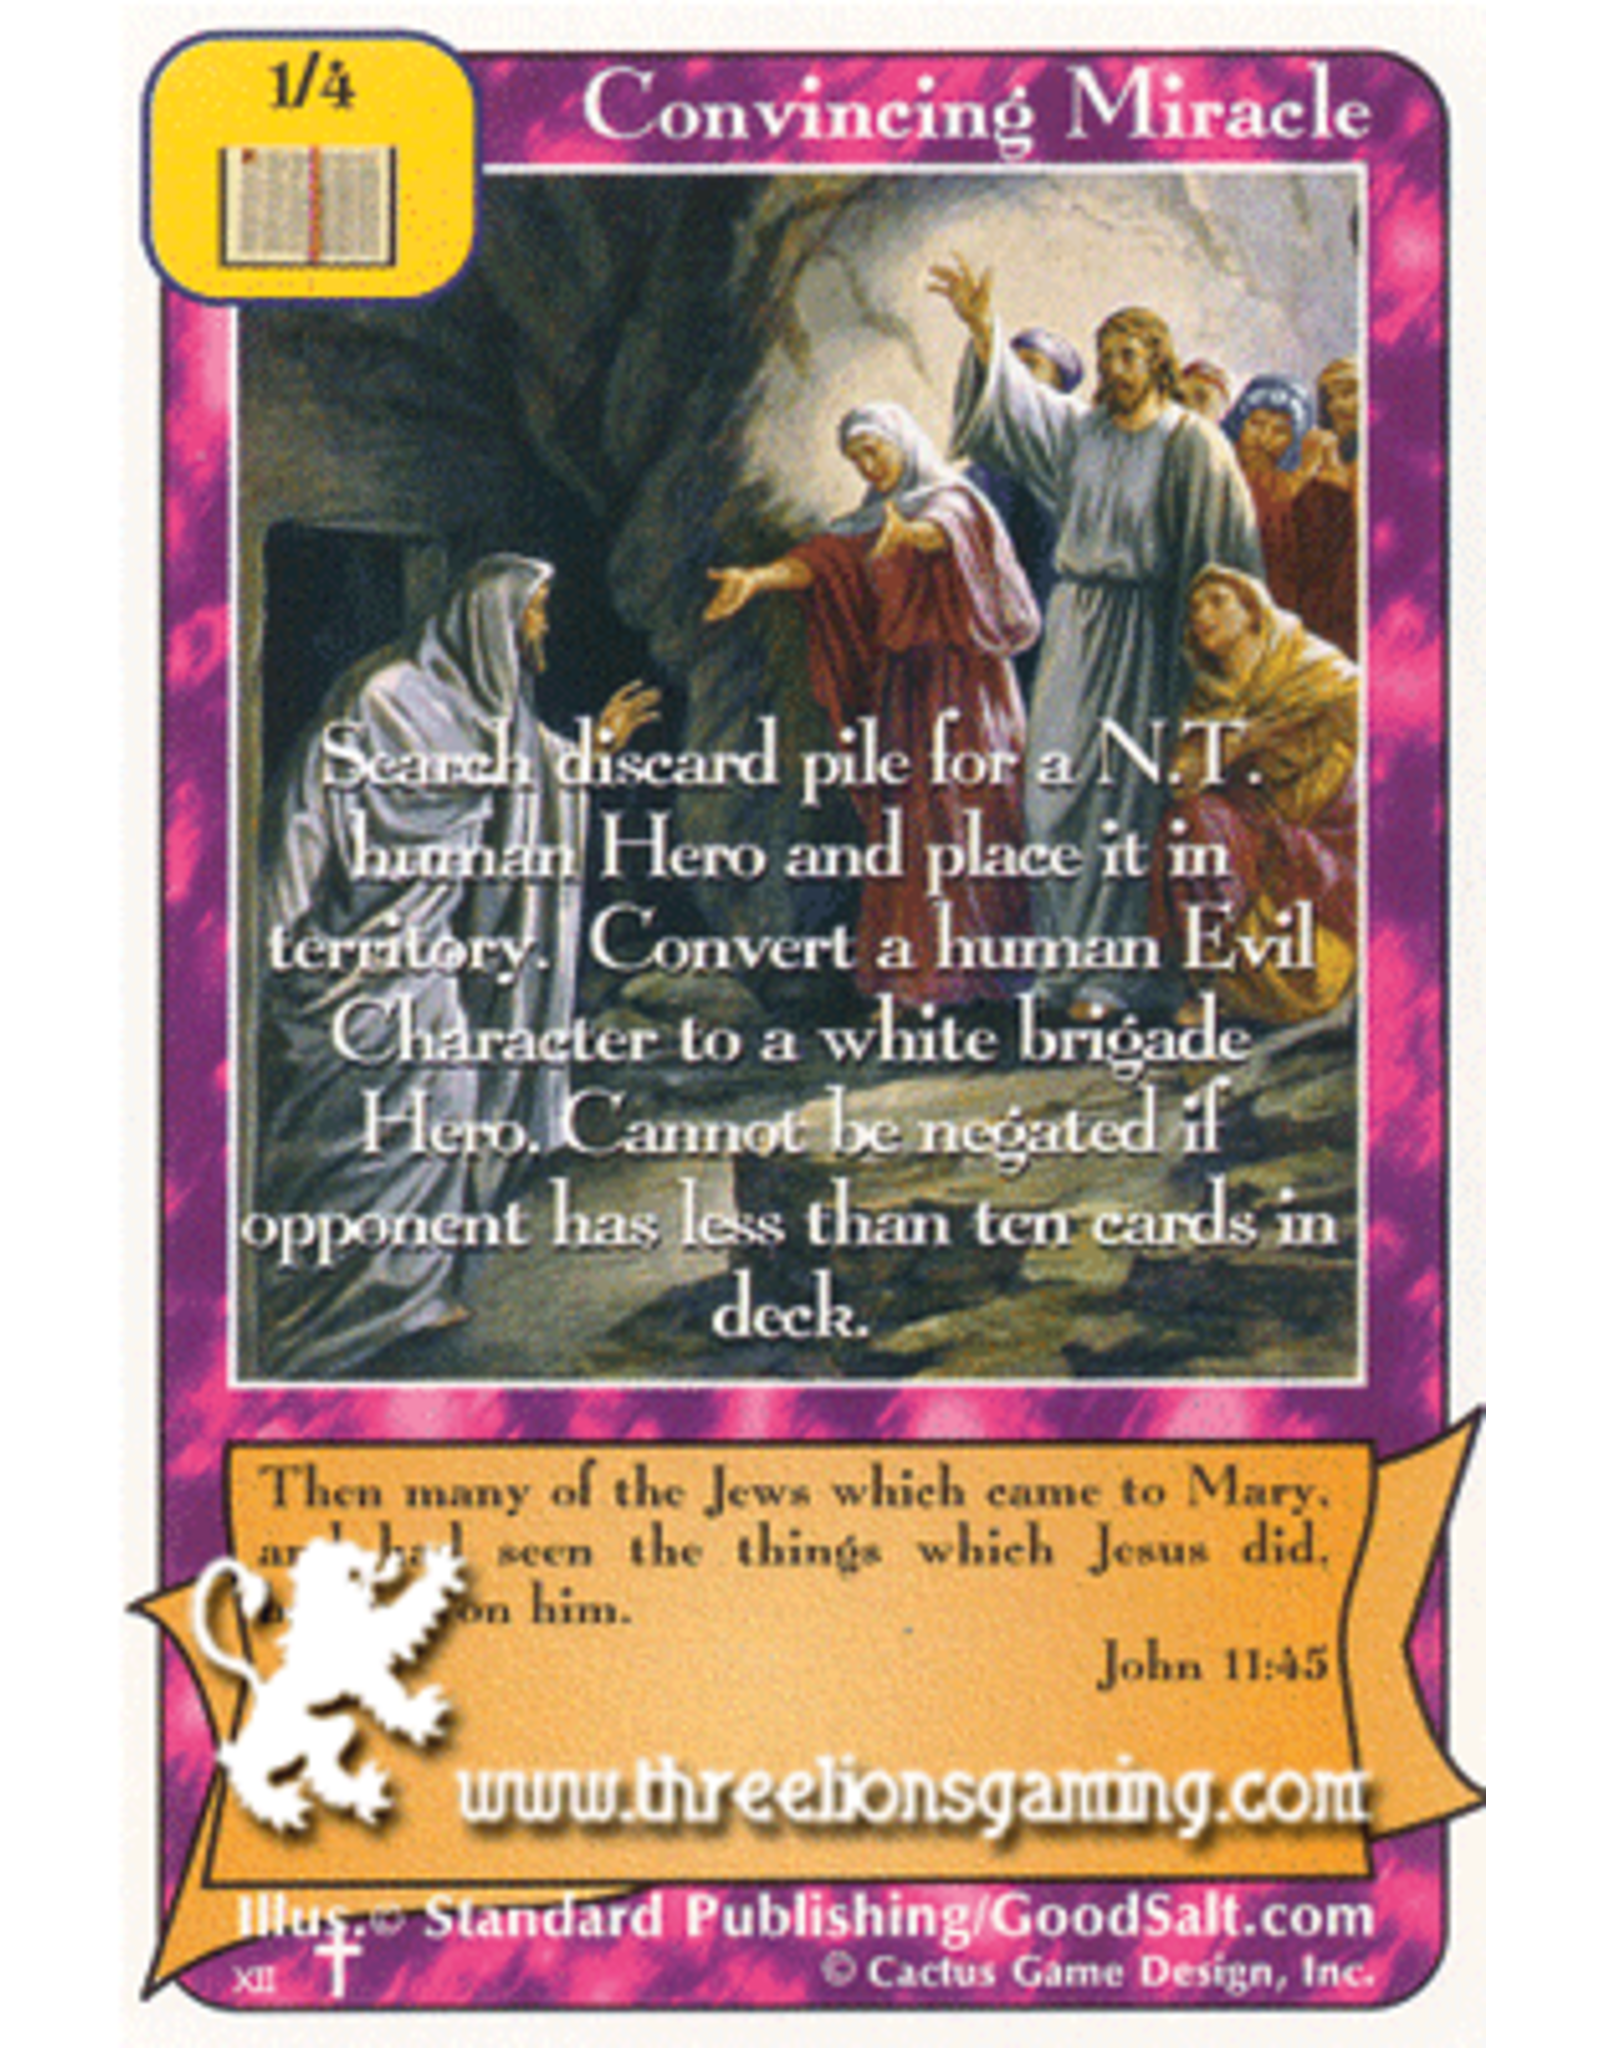 RoA: Convincing Miracle